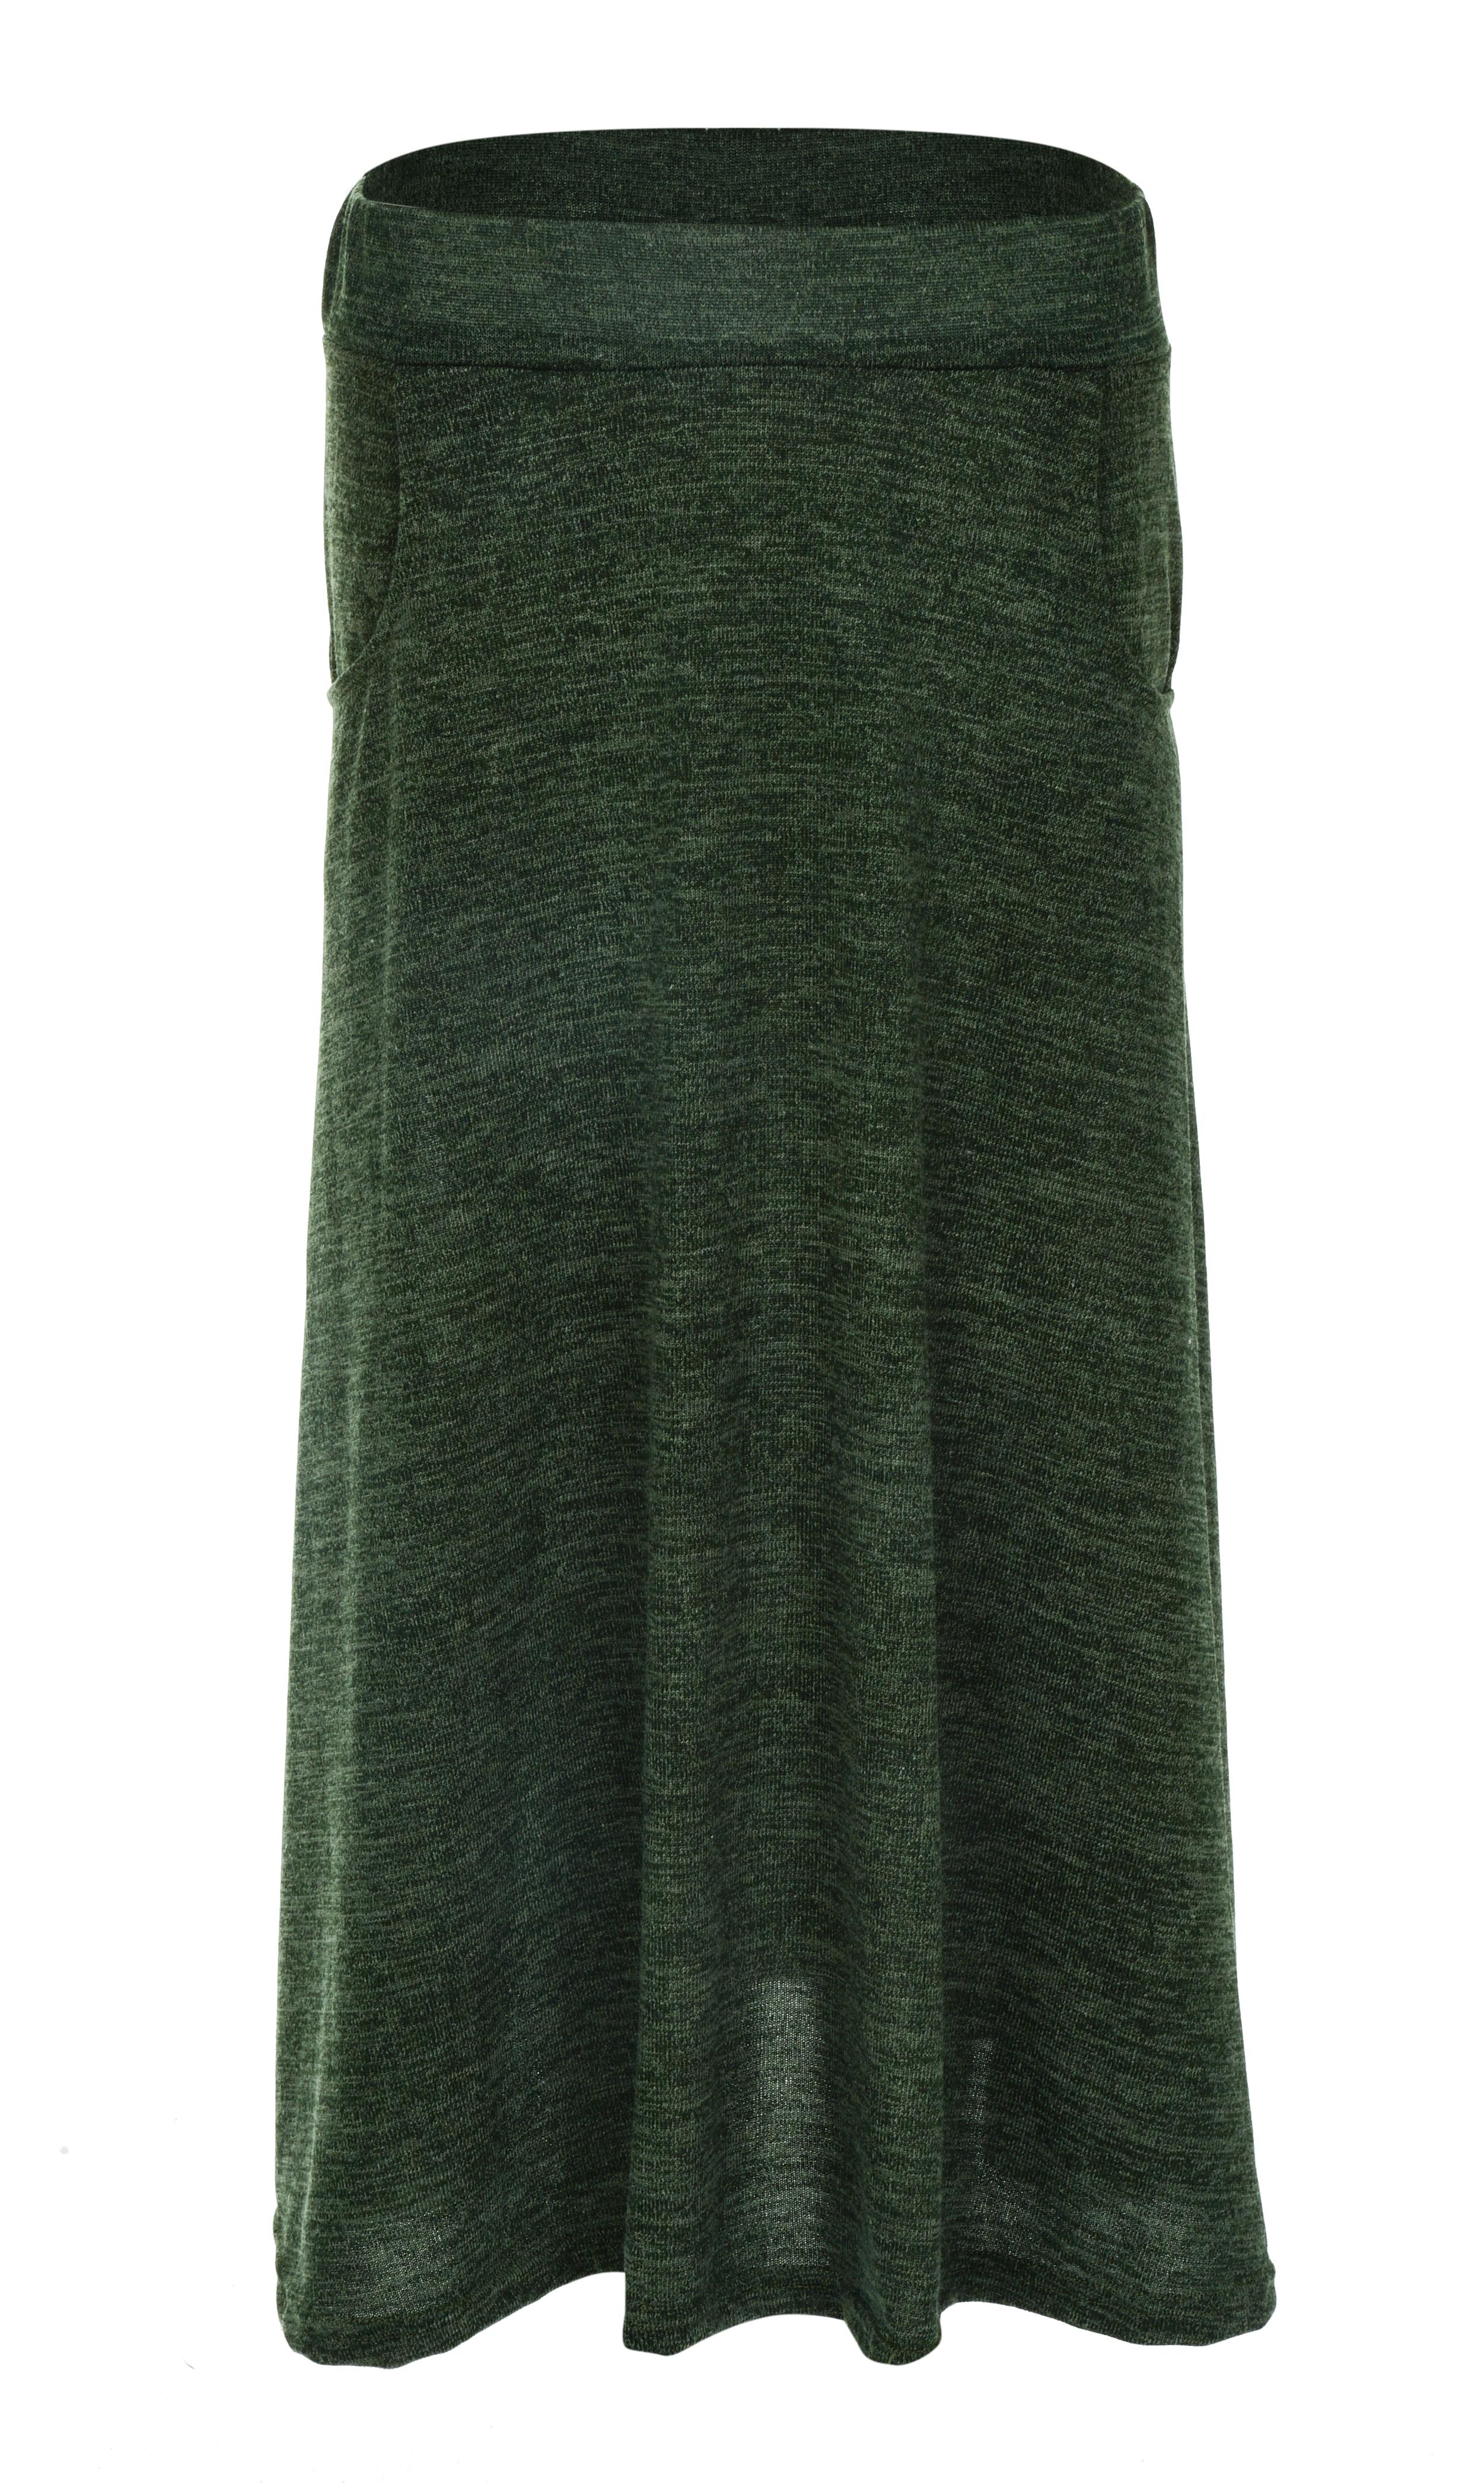 CONNIE, módní sukně s kapsami